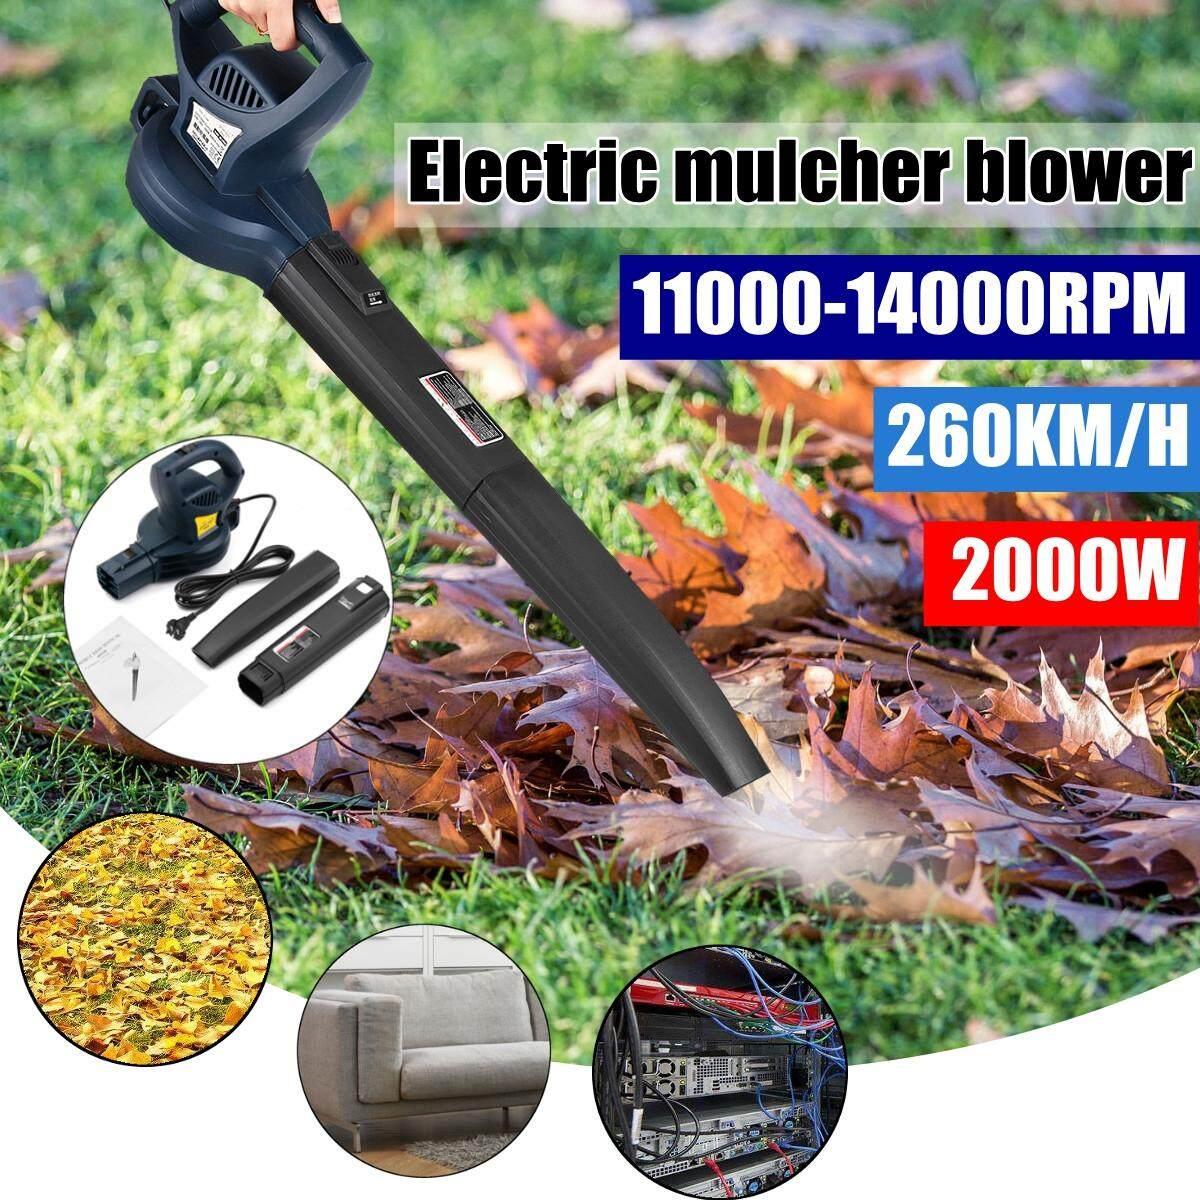 260km/h 2000W Electric Garden Leaf Grass Mulcher Blower Hoover Vacuum Home Tool